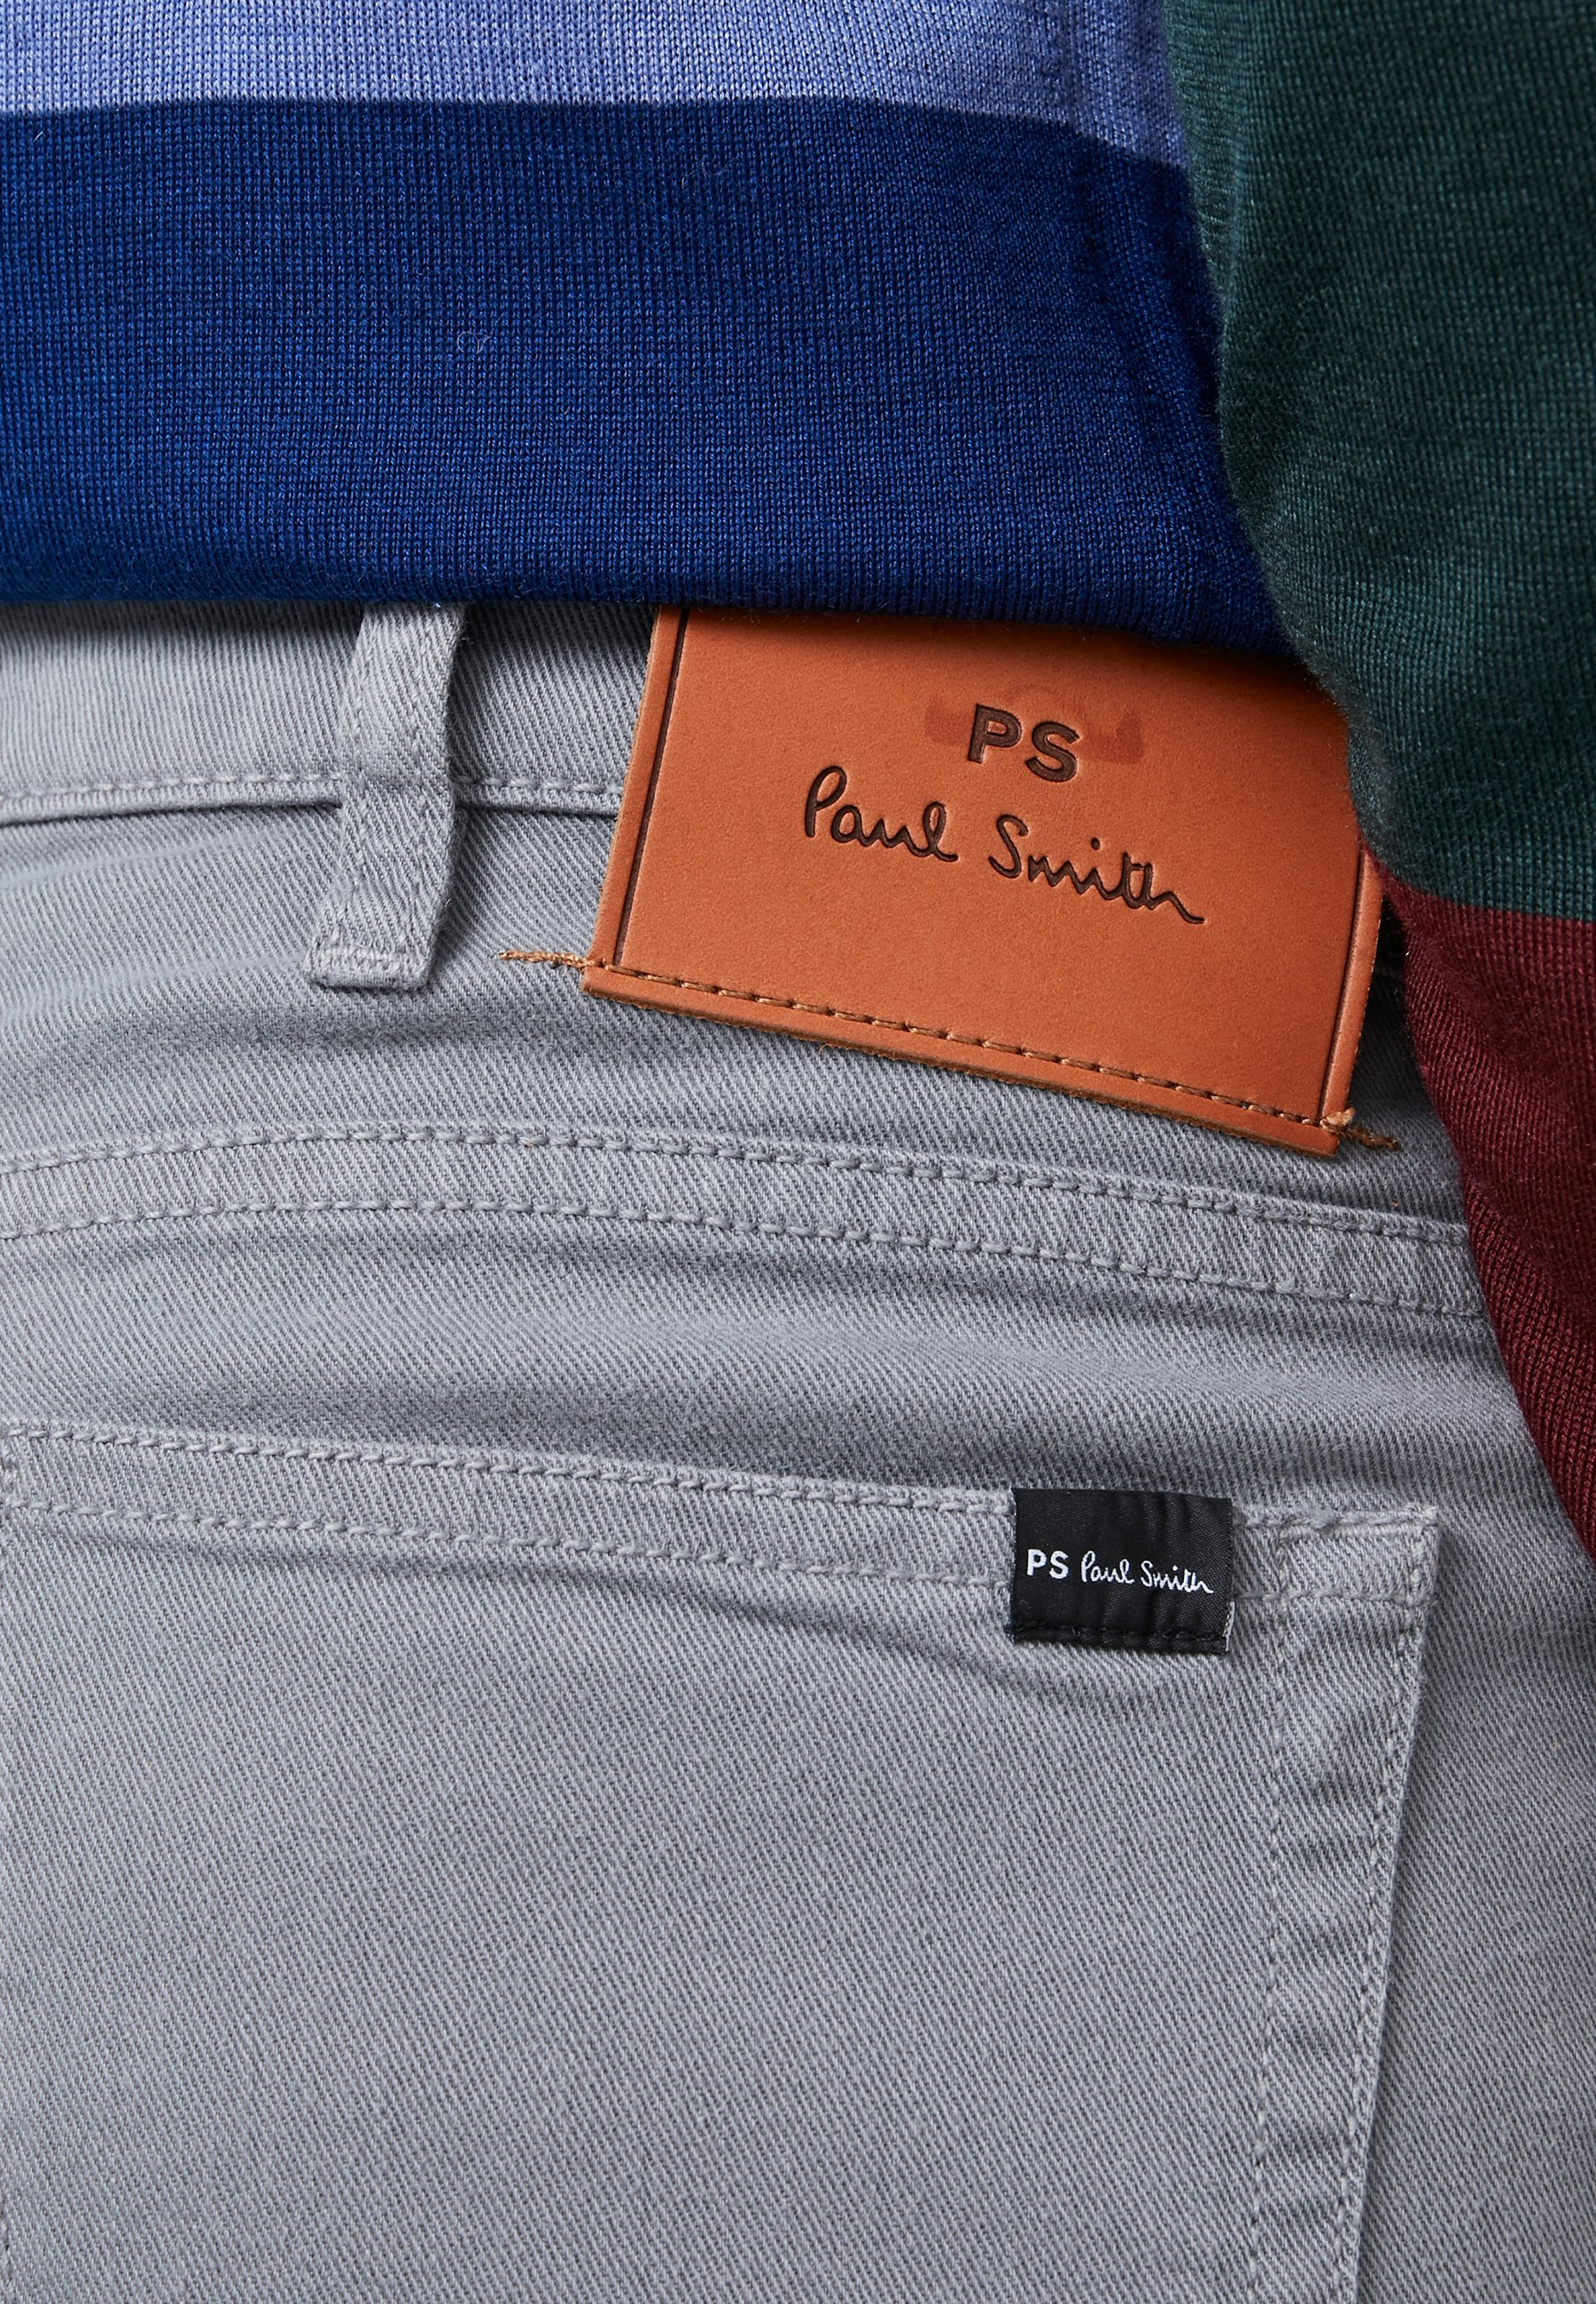 PS Paul Smith Jean slim - grey